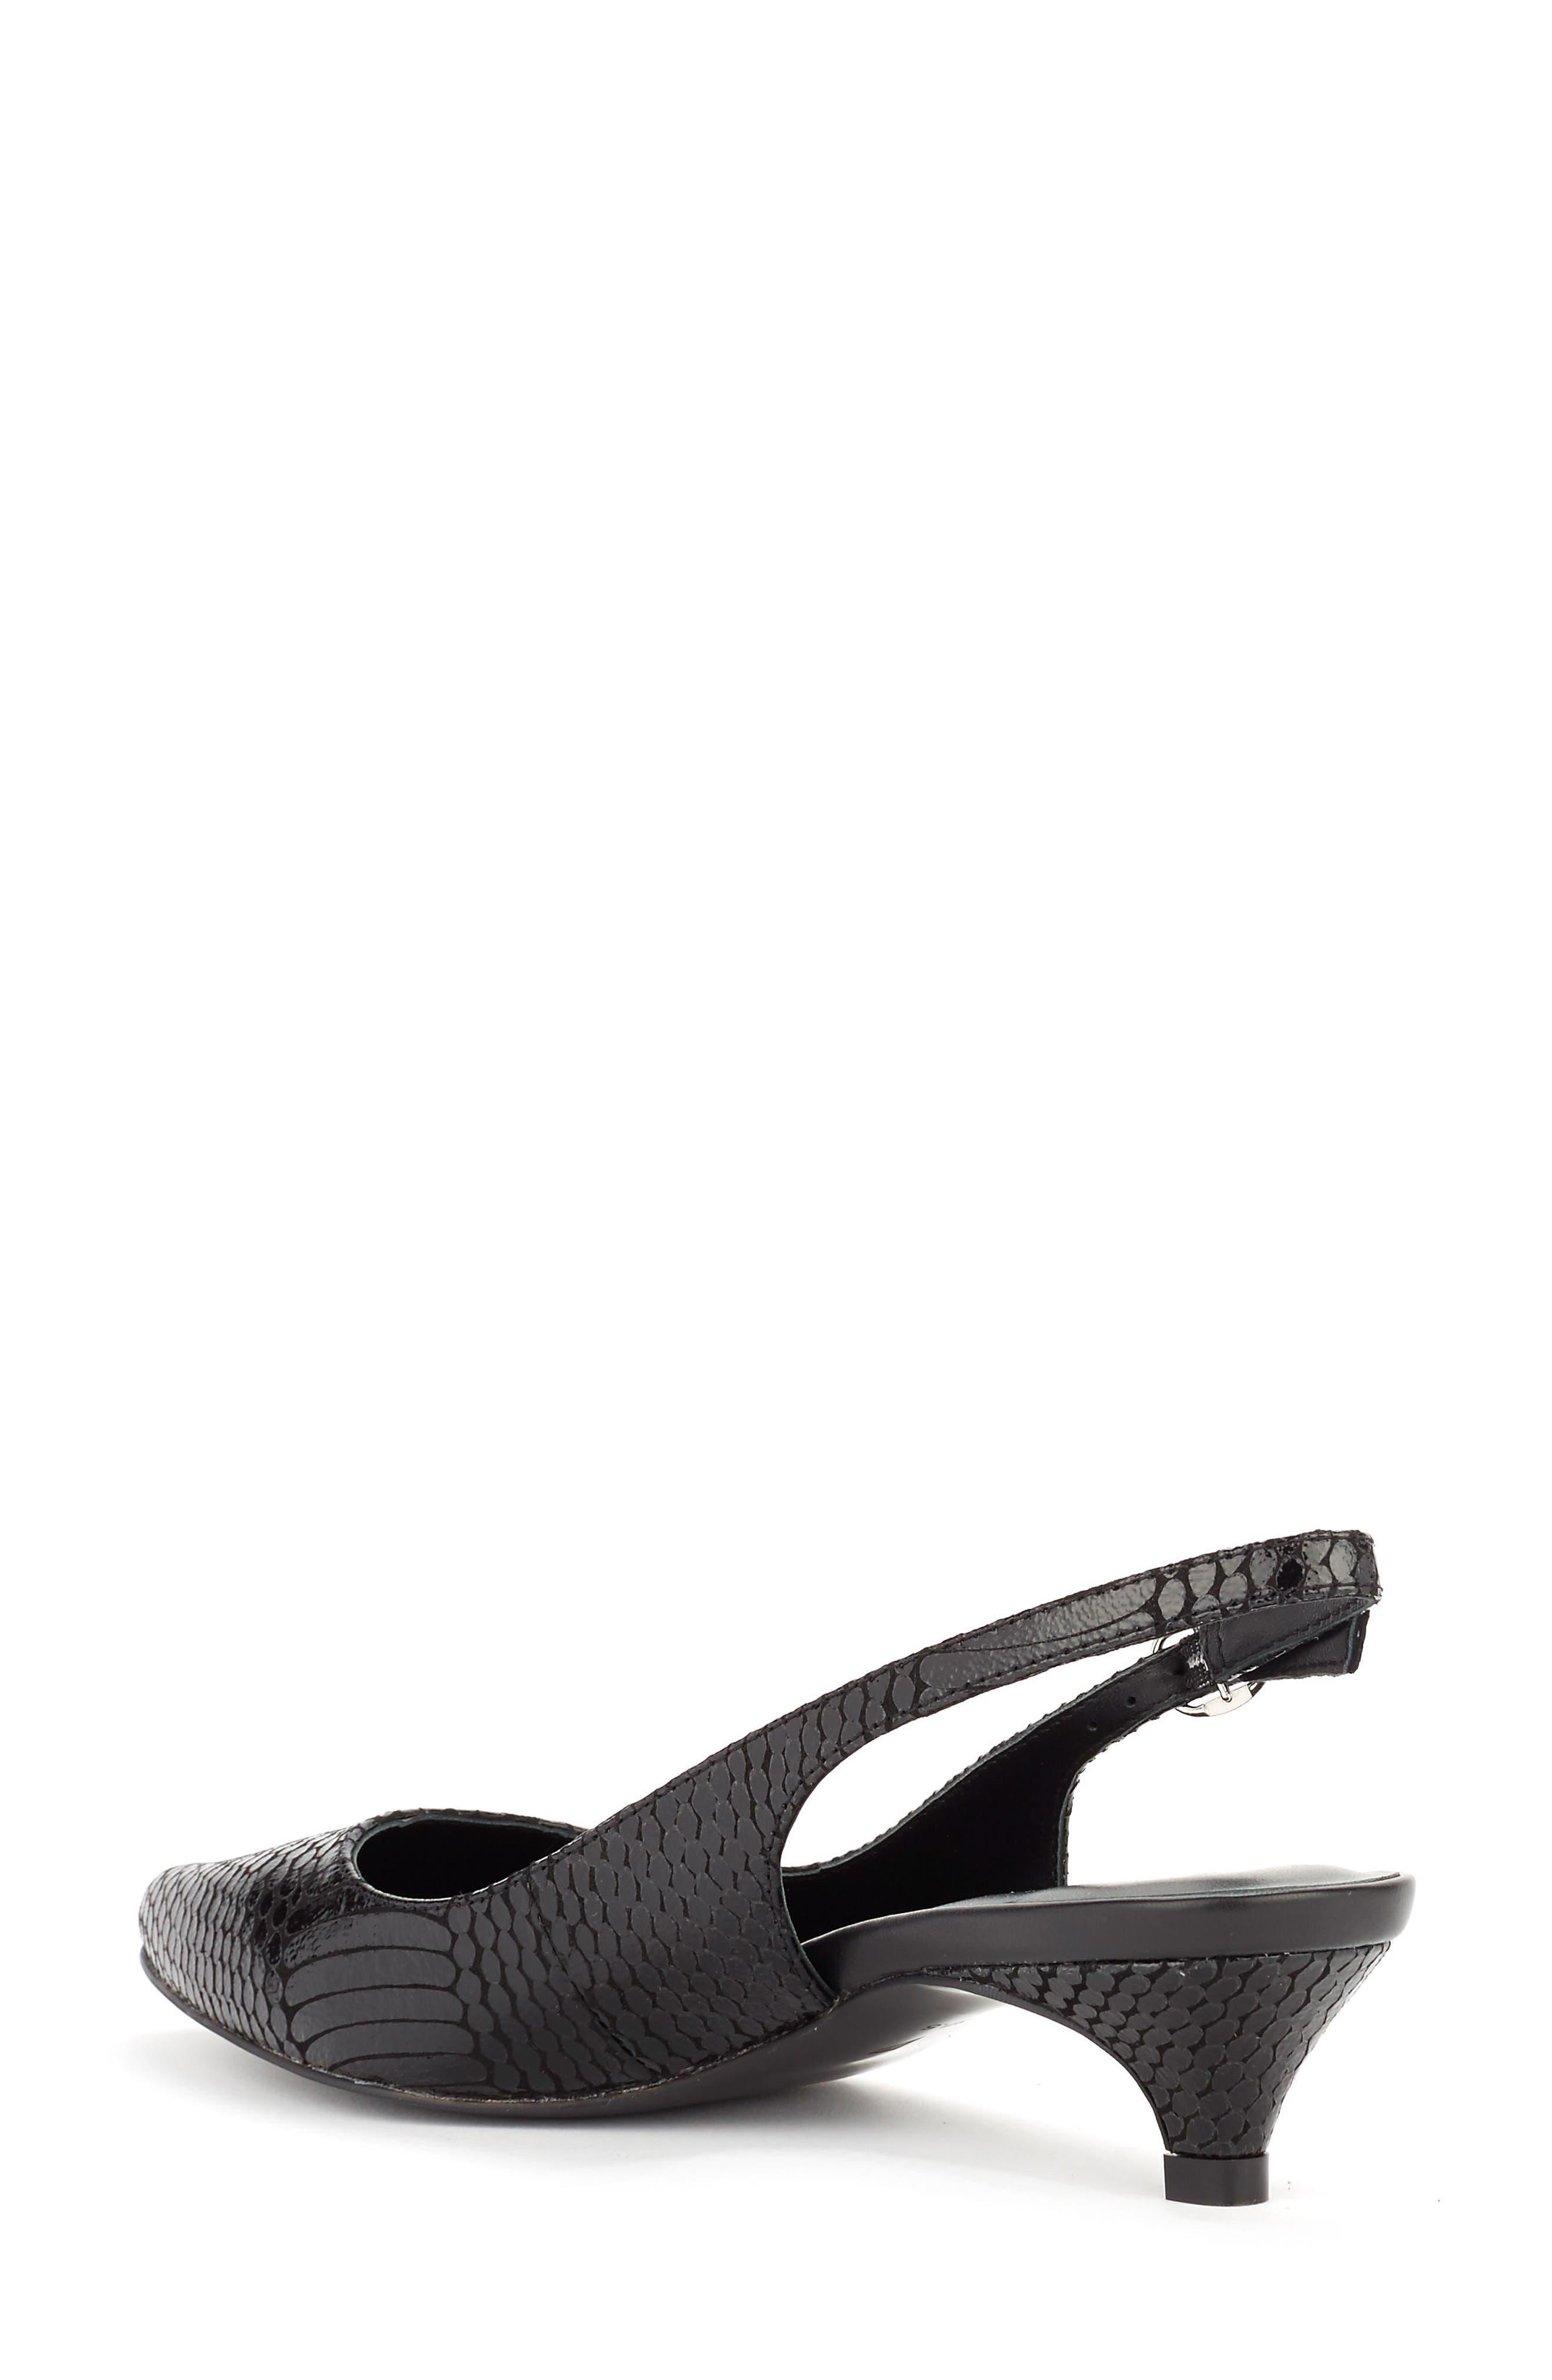 Alternate Image 2  - Shoes of Prey x Eleanor Pendleton Kitten Heel Slingback Pump (Women)